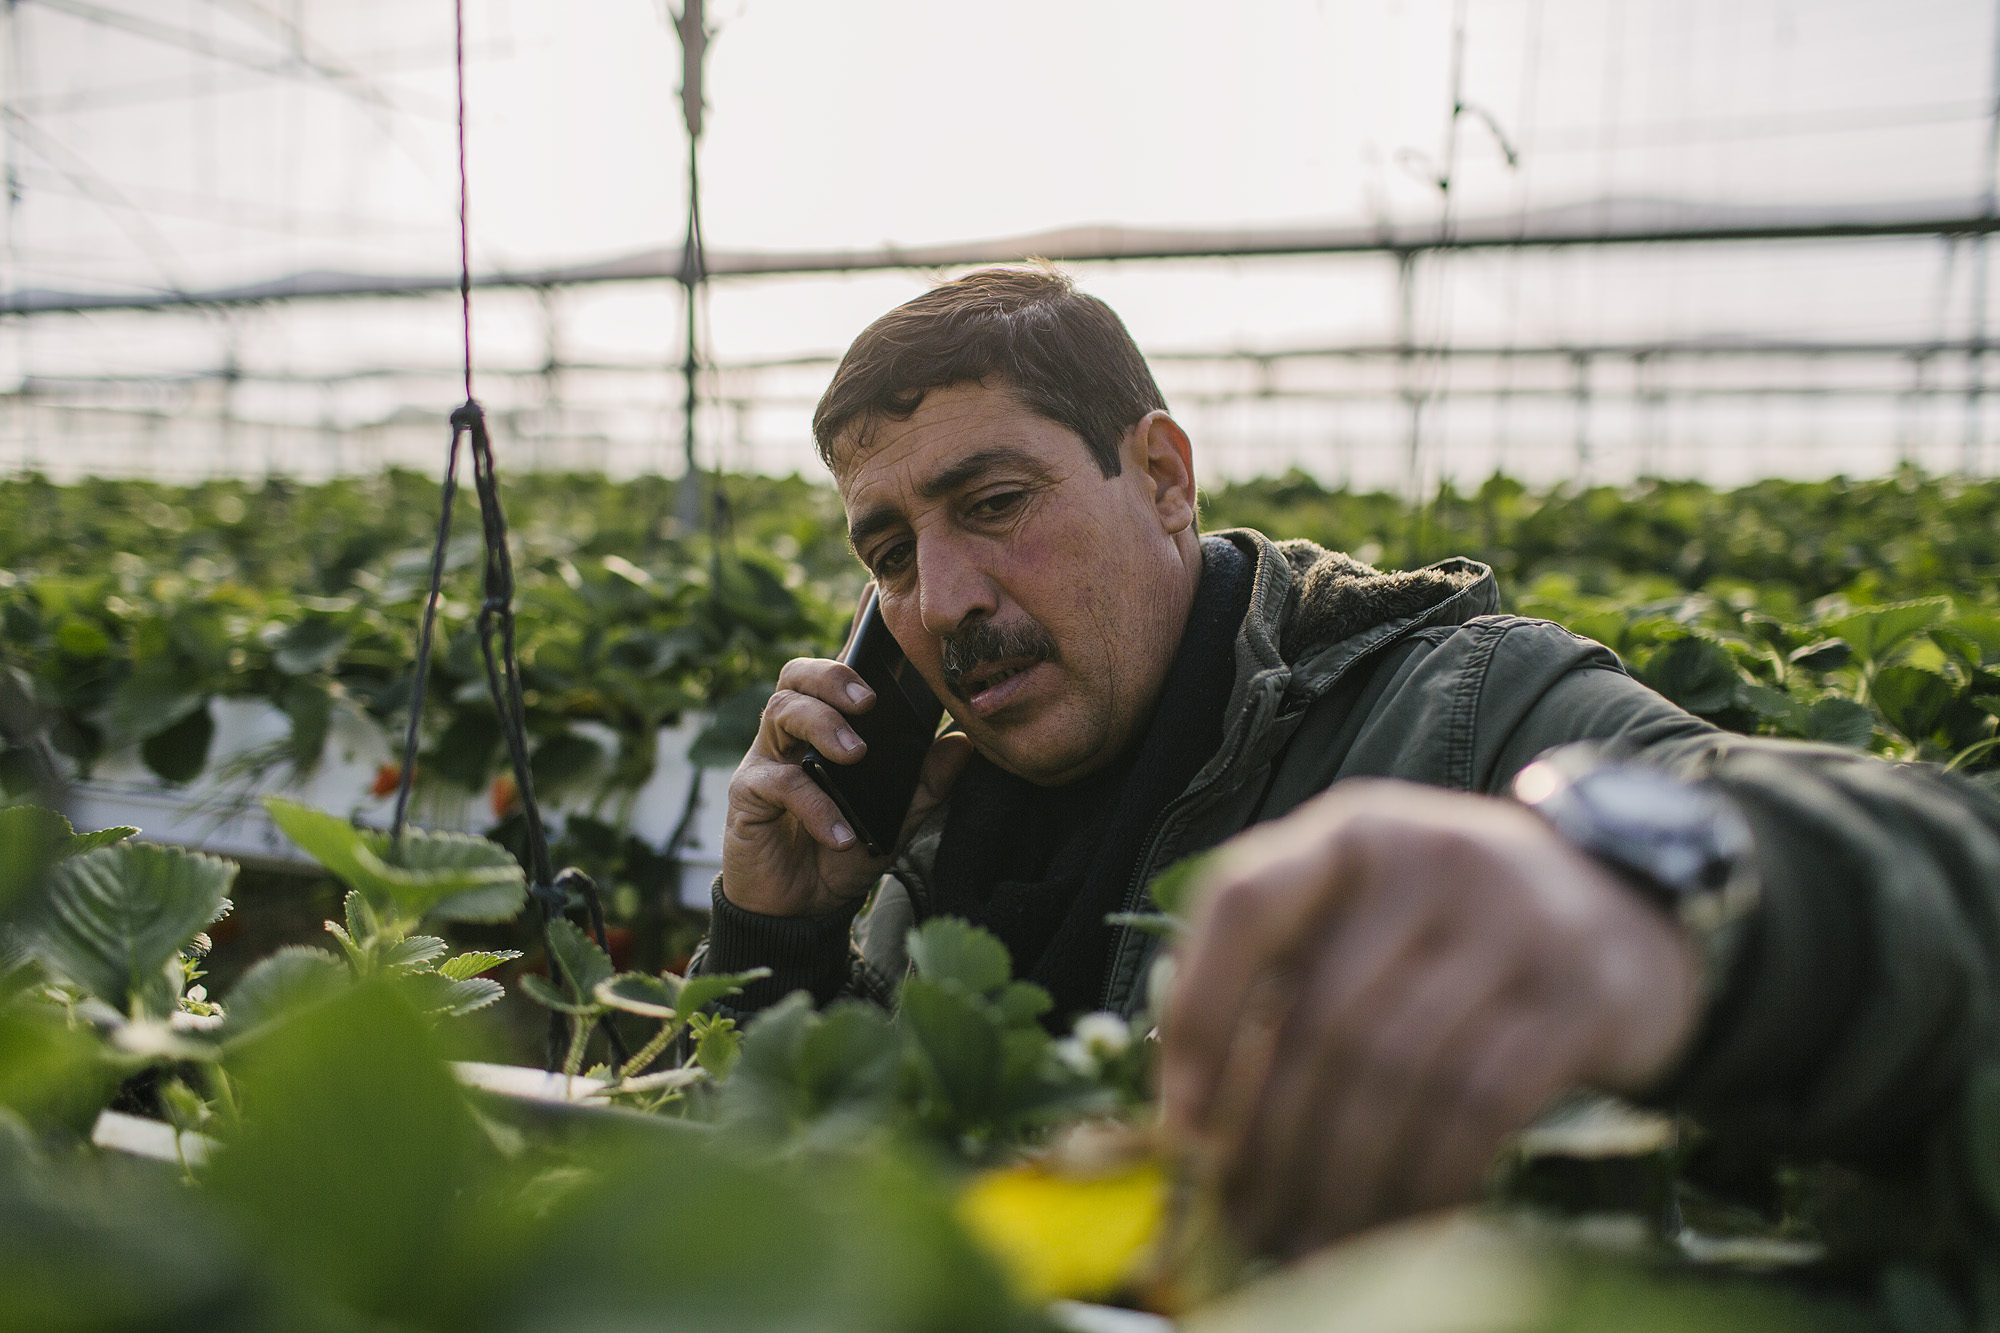 USAID-Israel-Day5-Strawberries-TD4A8013.jpg